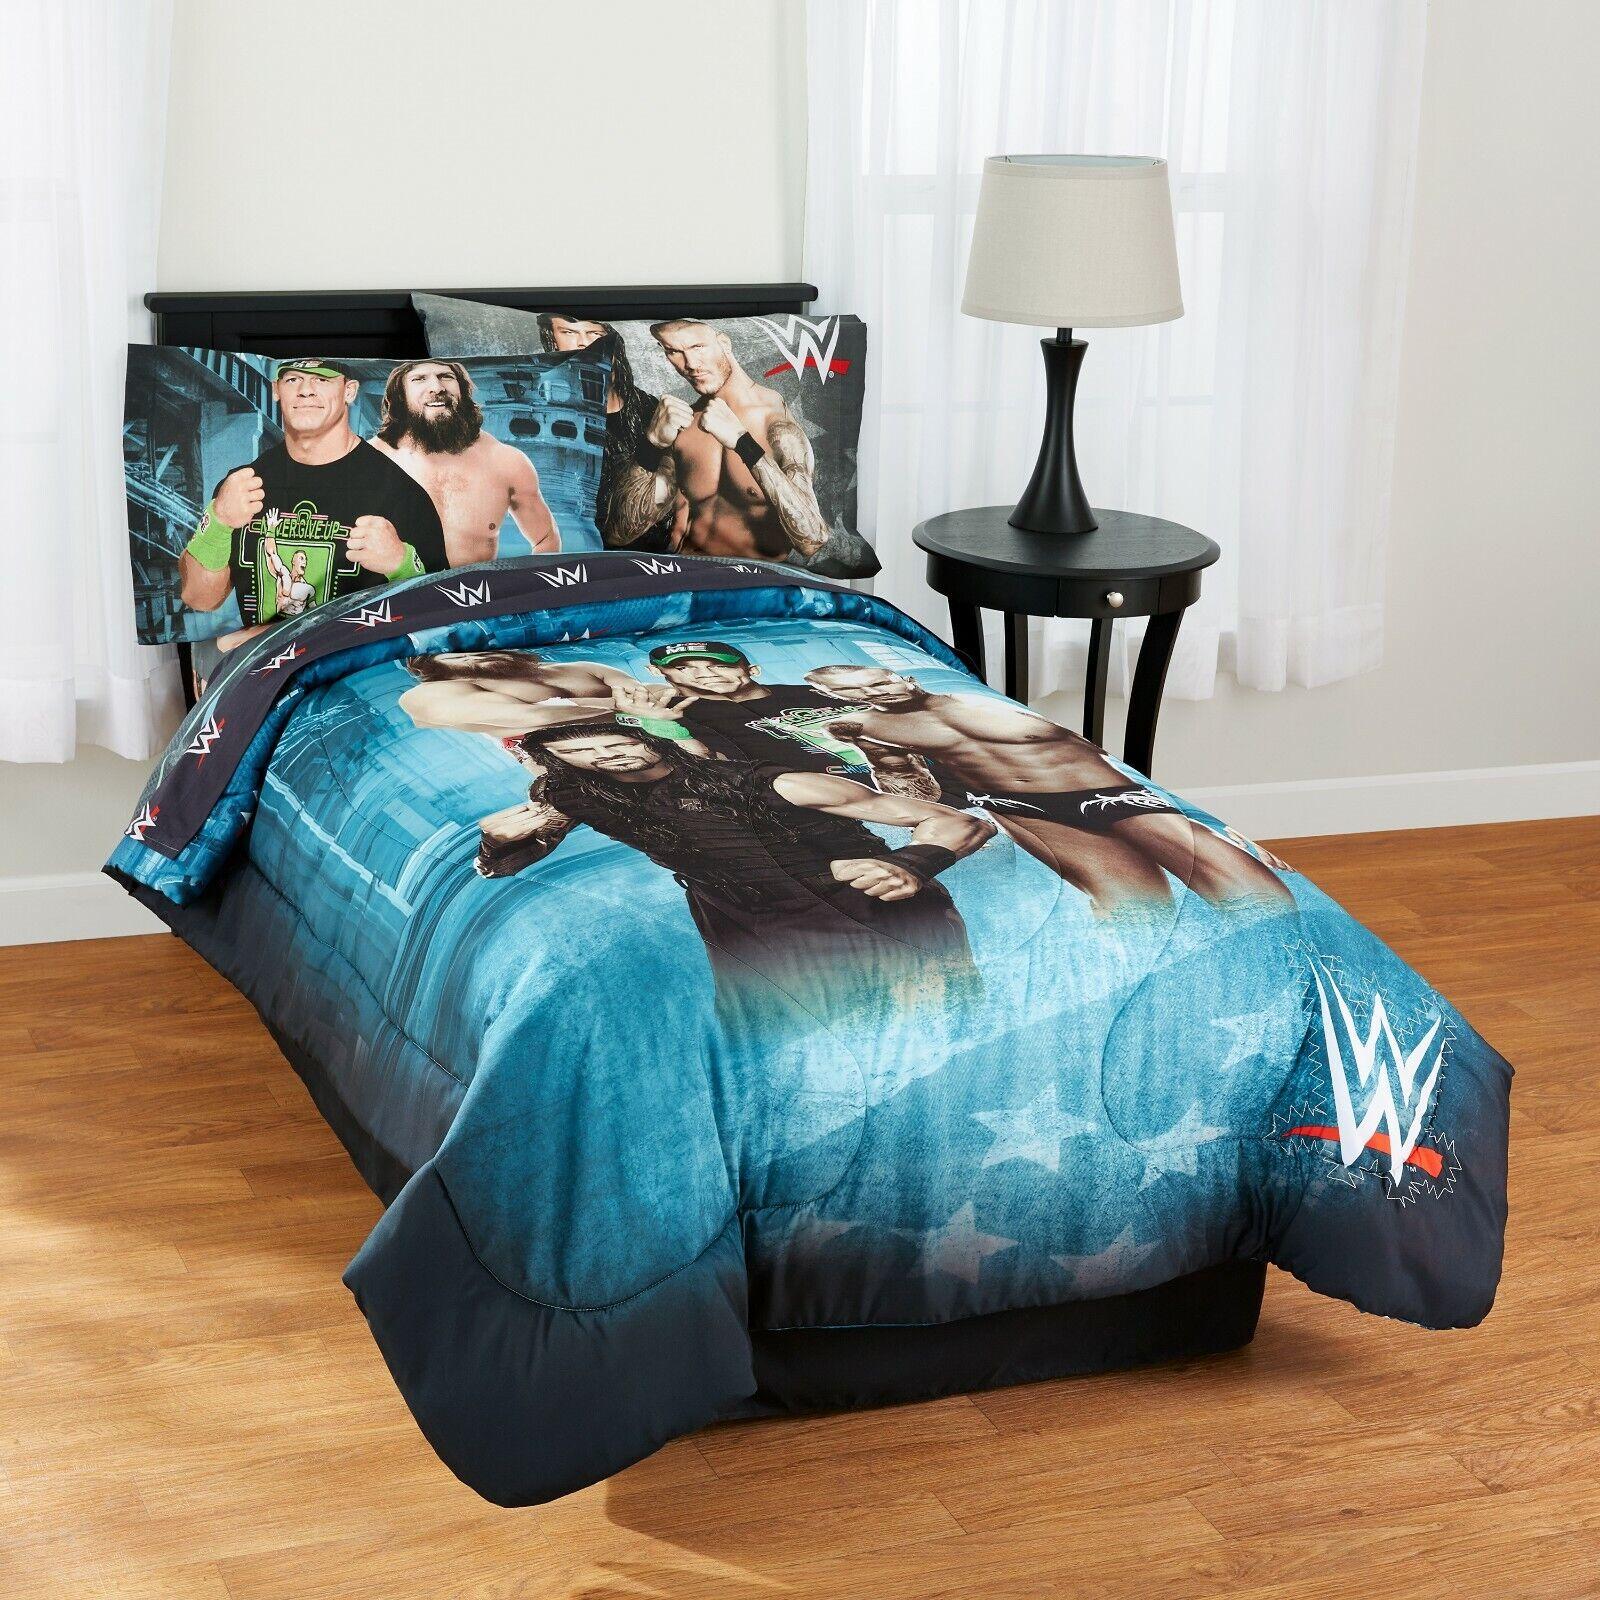 ALL SIZE WWE Comforter & Sheet Set Bedding Set Boys Comforte